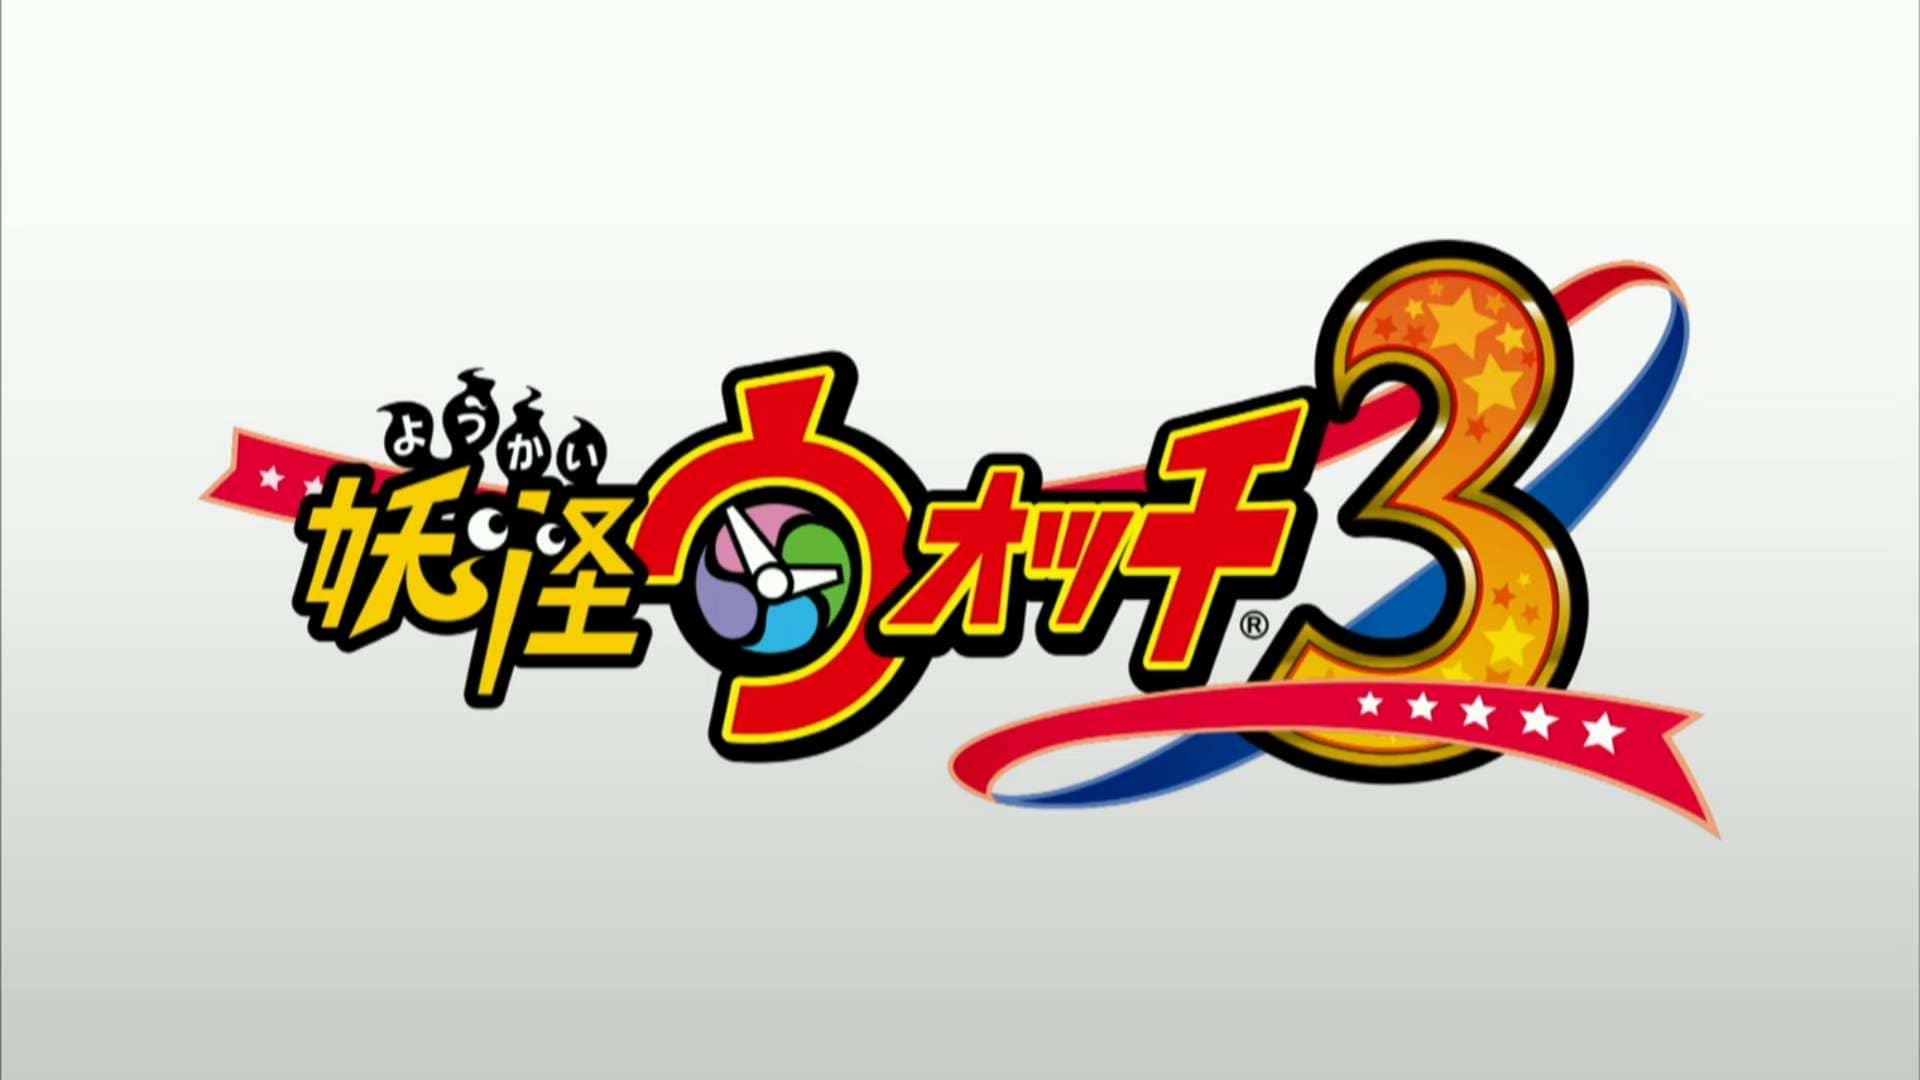 Yo Kai Watch 3 Mulai Dipasarkan Di Jepang Pada Musim Panas